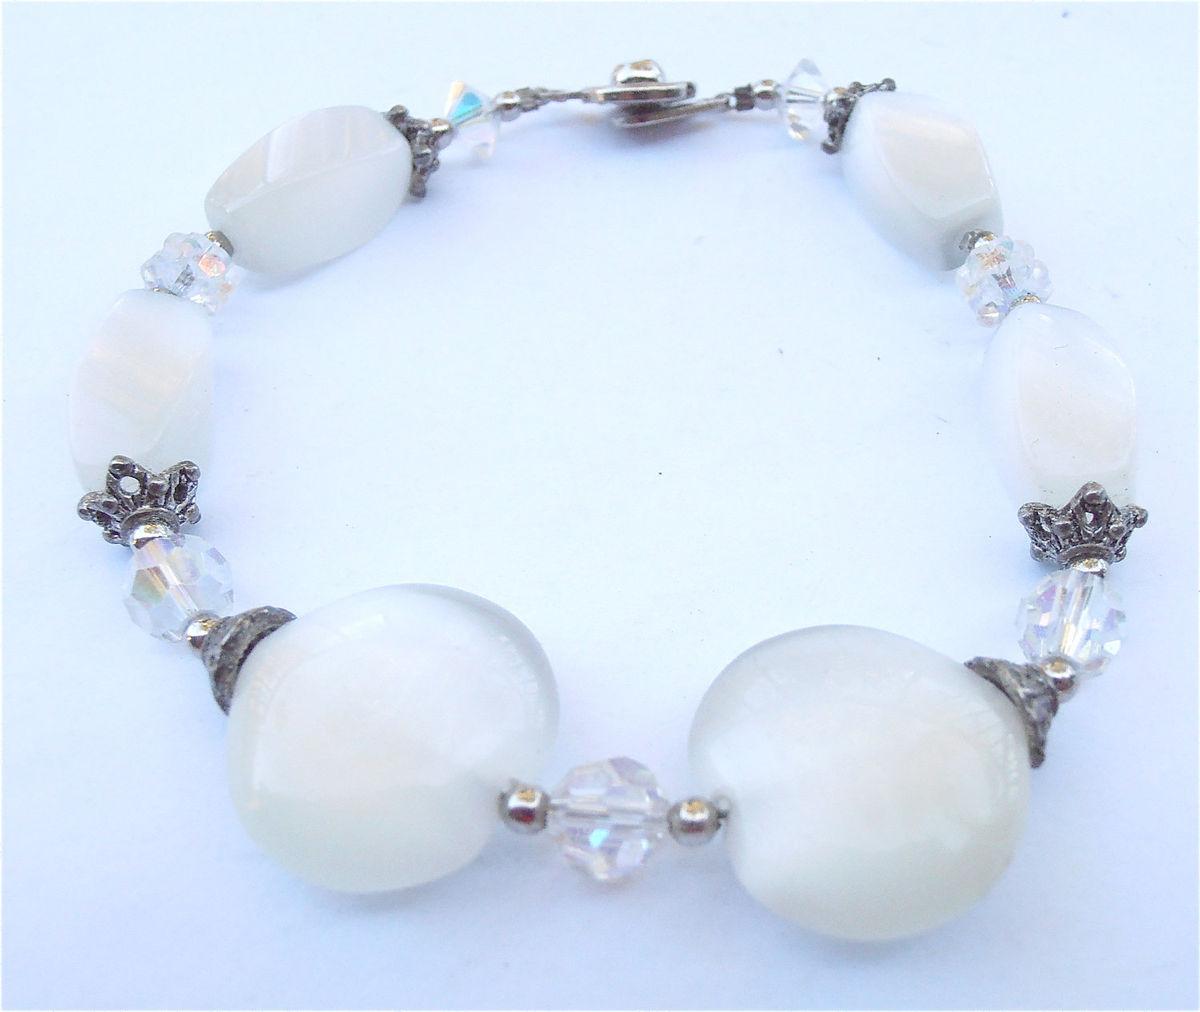 CapsA New Popular Gorgeous White Women Jewelry Bangle Bracelet Shell Wedding Bridal Gifts